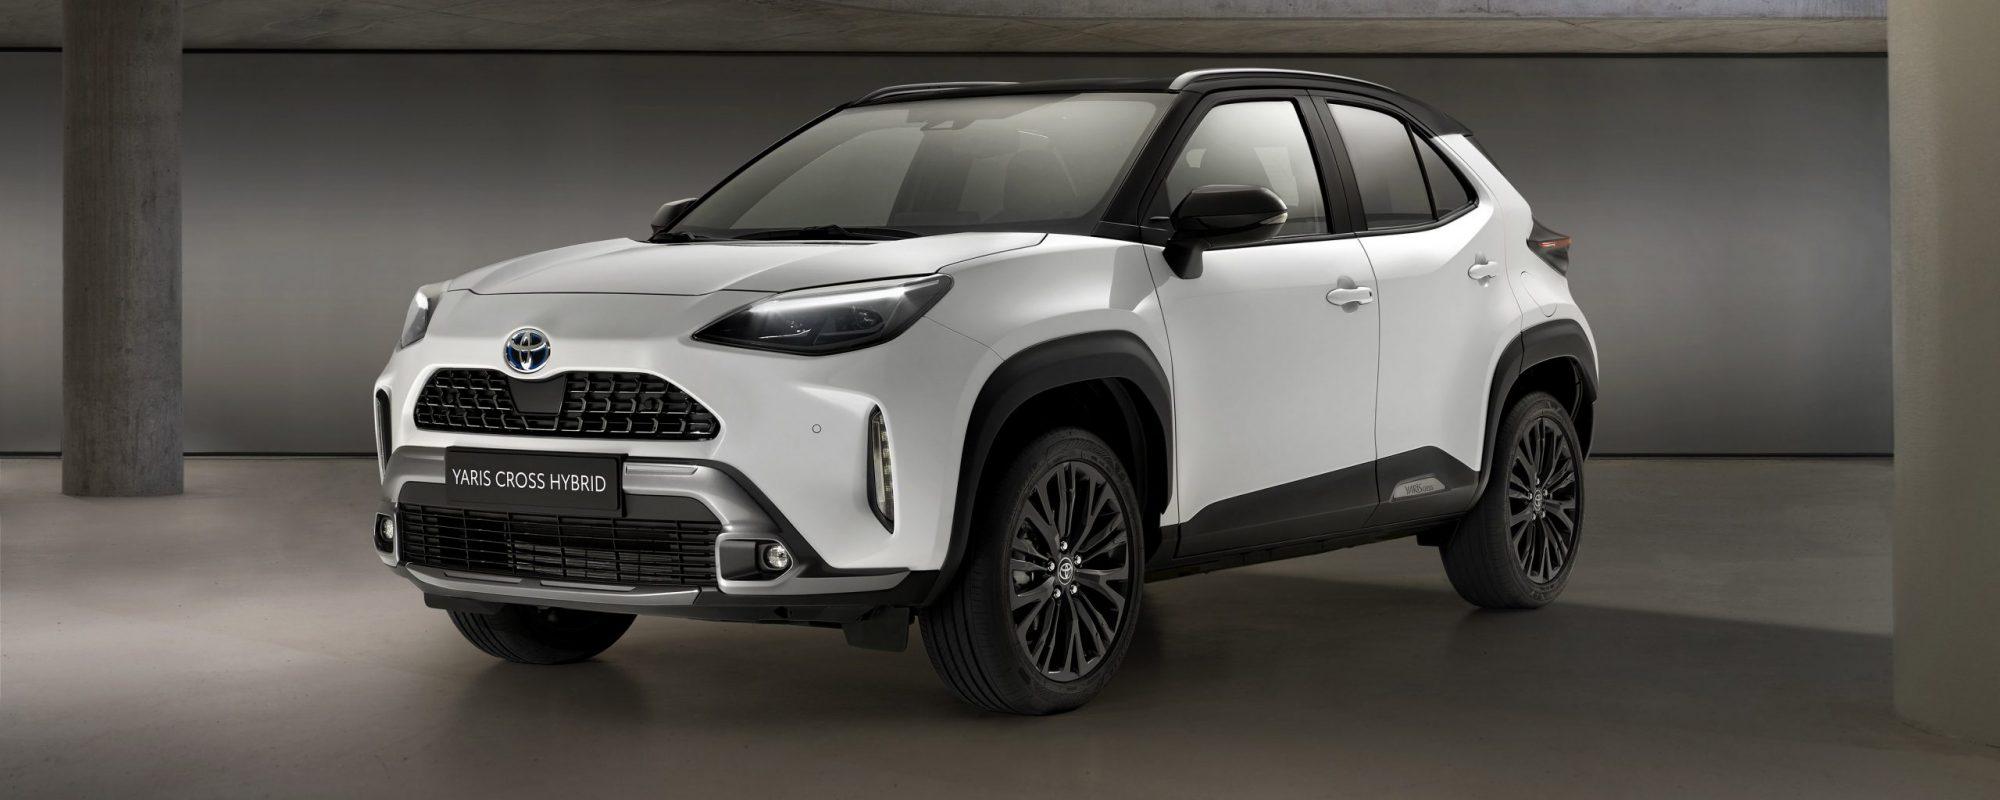 01-Toyota-Yaris-Cross-Adventure-2000x800